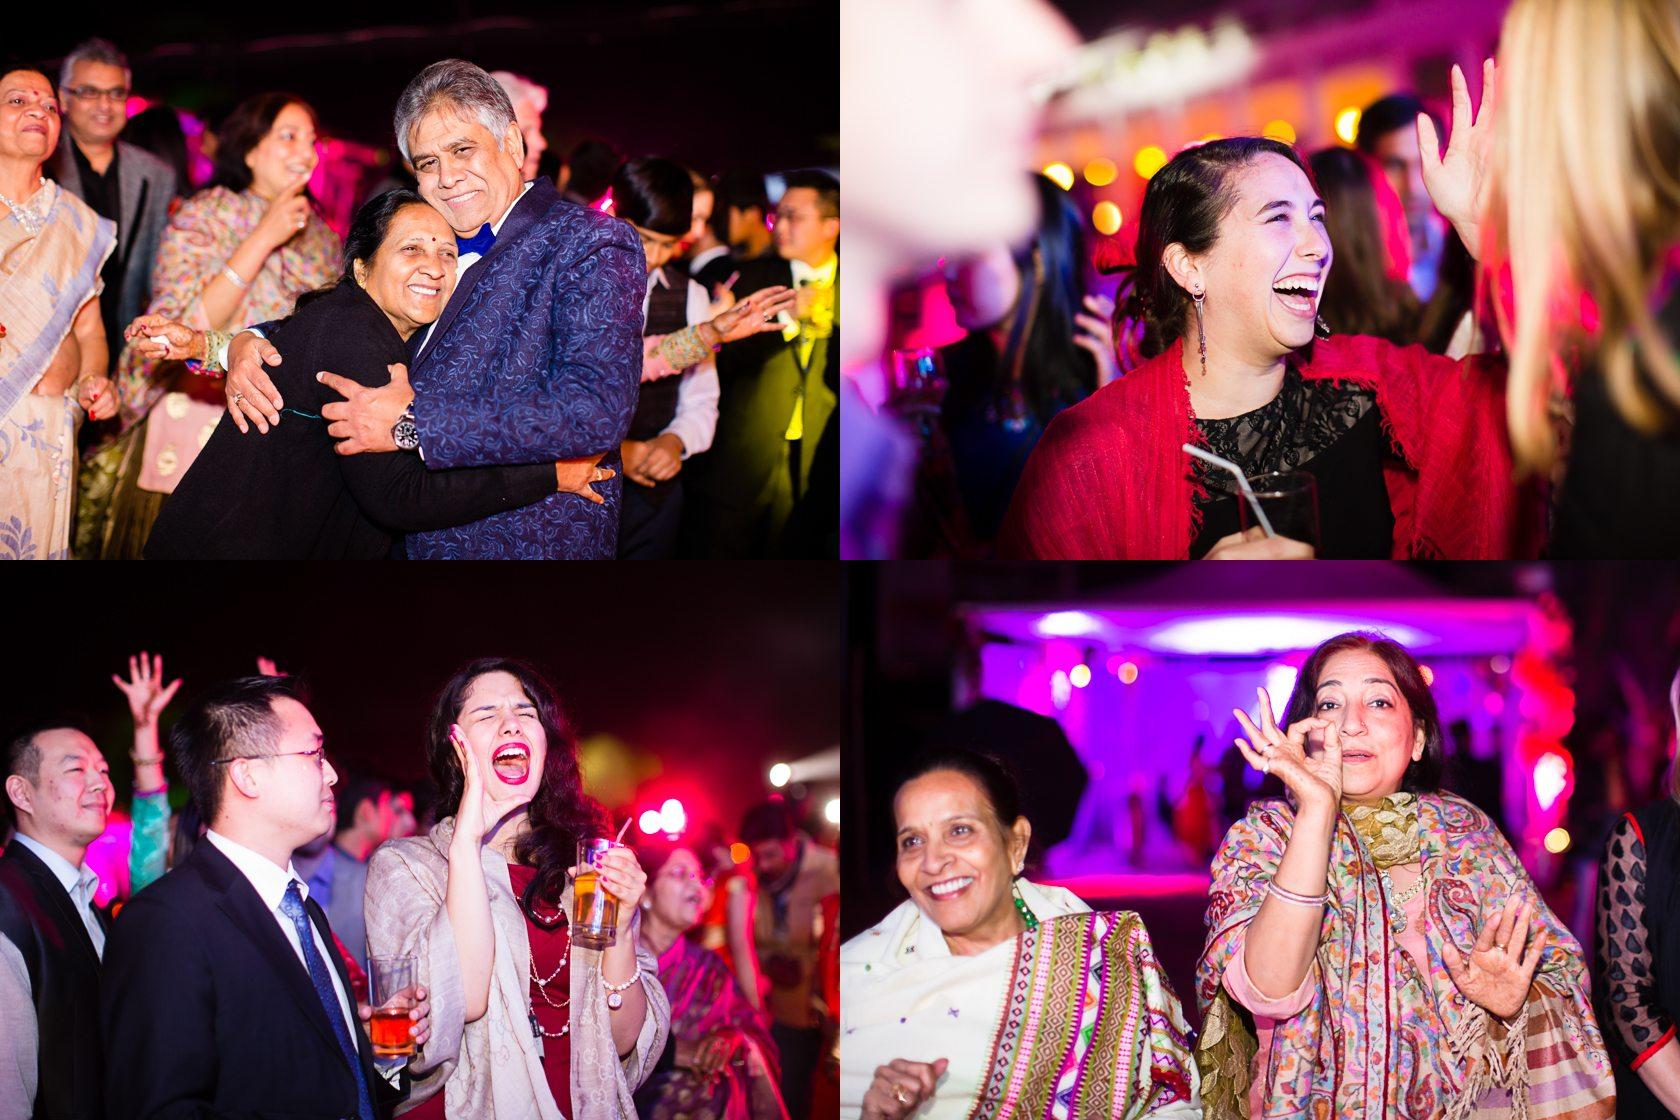 India_Wedding_243.jpg